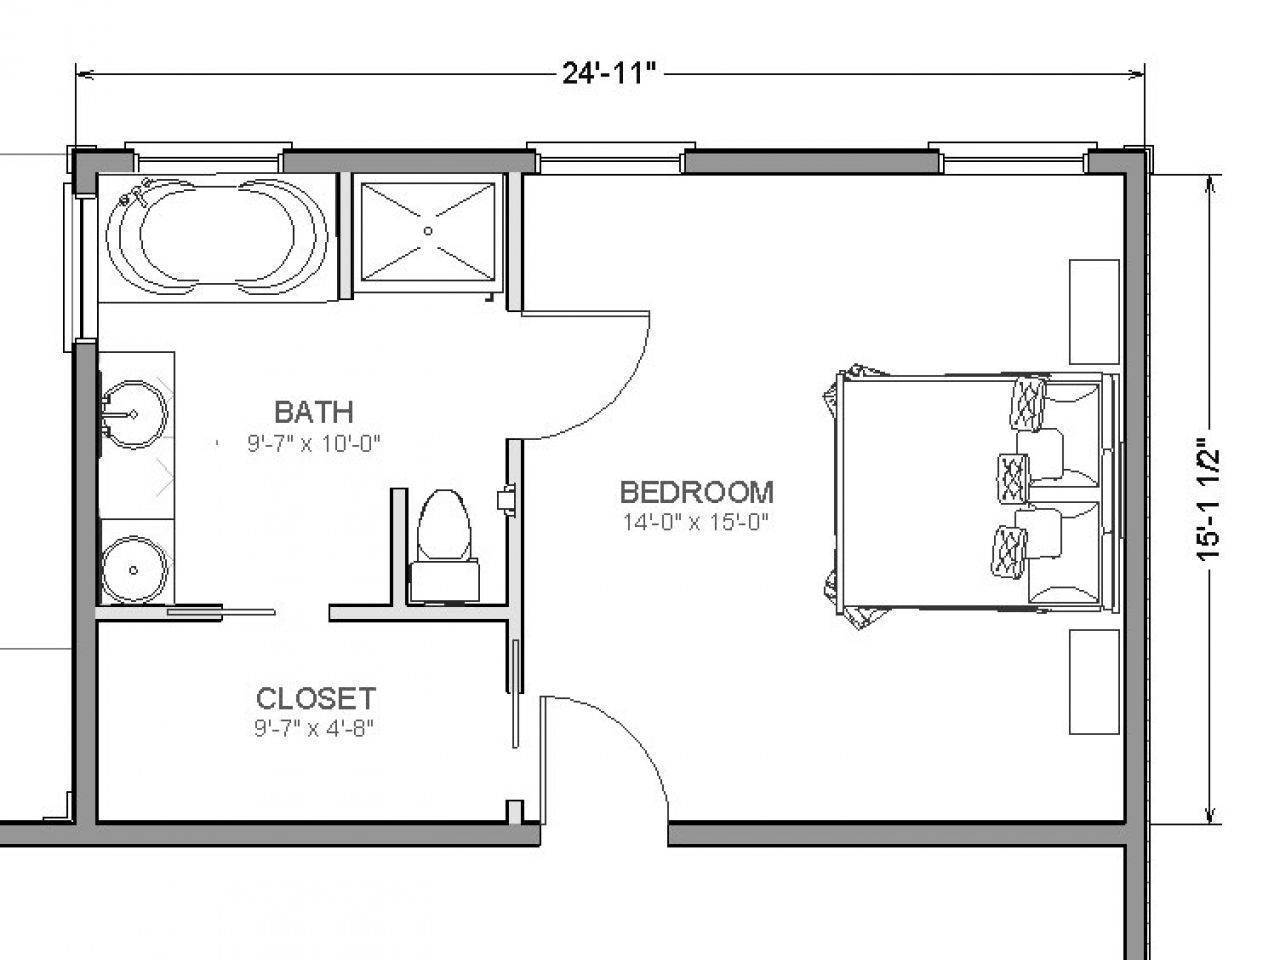 Images Luxury Master Bathroom Layout Romantic Luxury Master Bedroom Master Bedroom Suite Ad Master Bedroom Plans Master Bedroom Addition Master Bathroom Layout